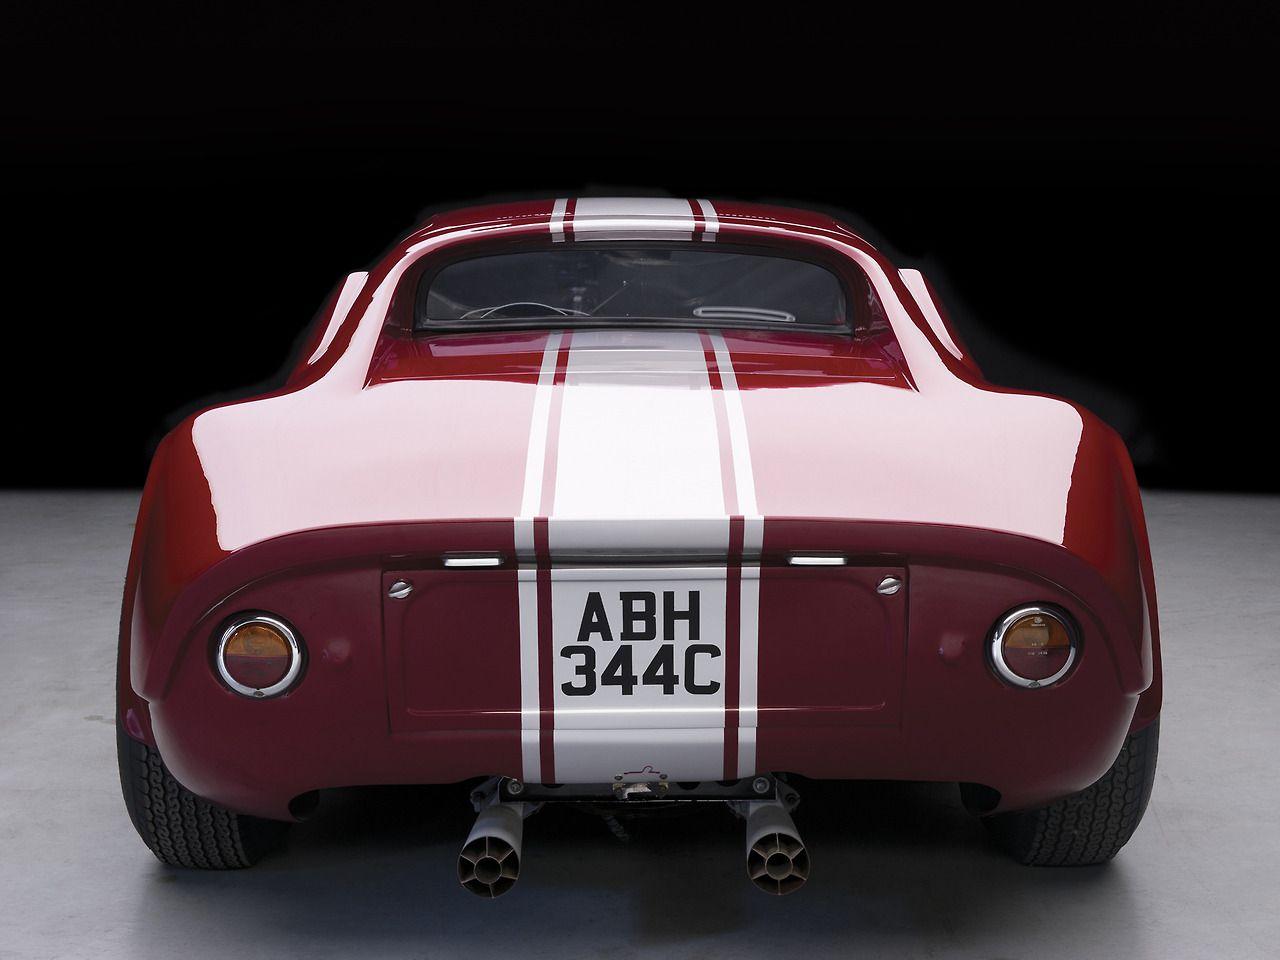 Porsche 904 6 carrera gts prototype 1963 65 for Garajes de ensueno